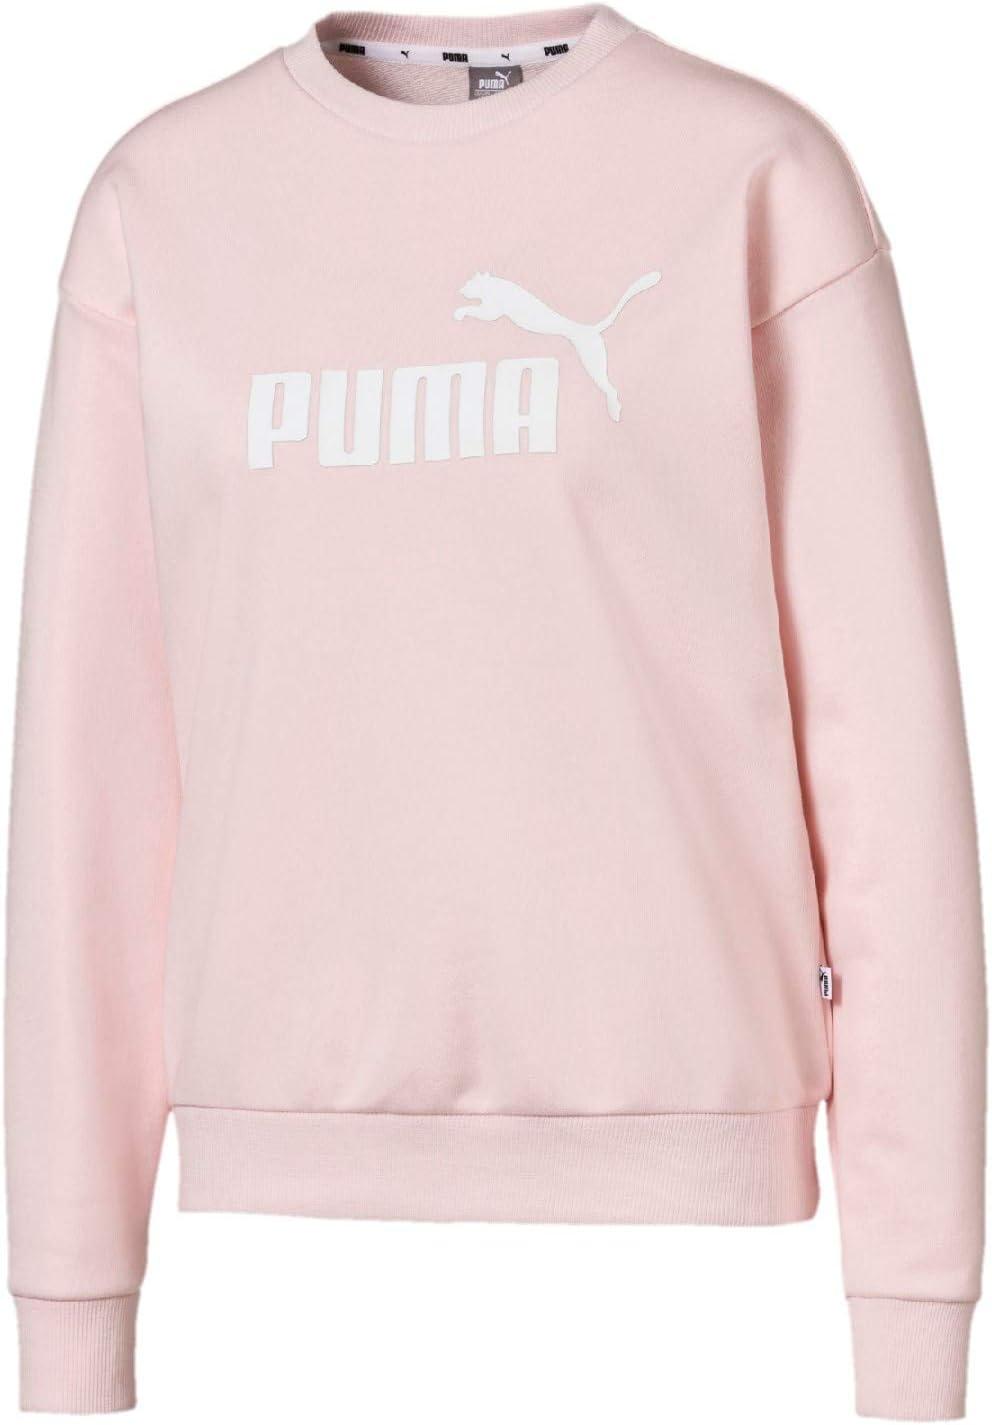 PUMA Essential Logo Crew Sweatshirt-Rosa, Weiß Camisetas, Mujer